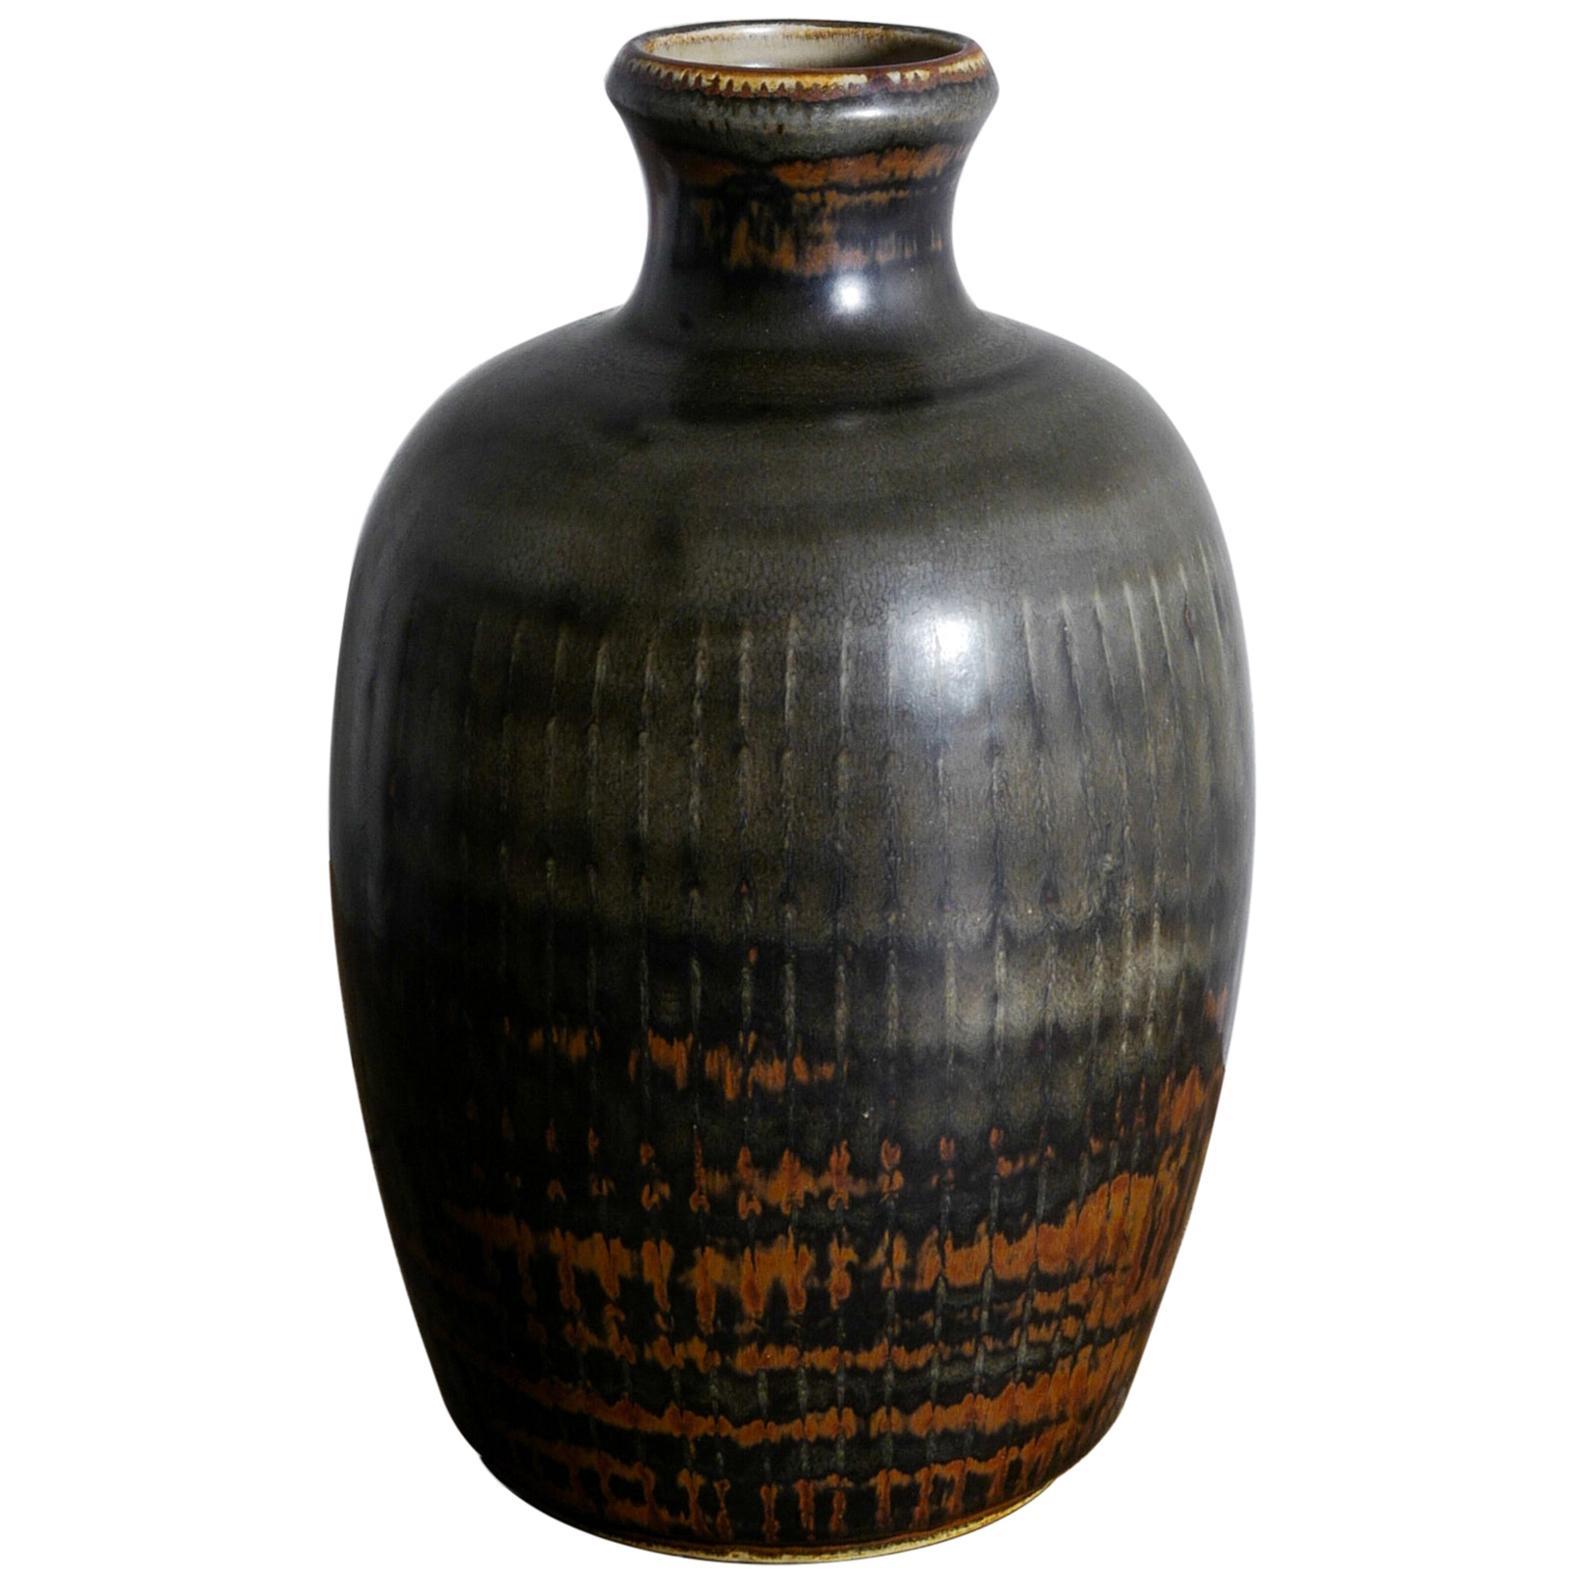 Carl-Harry Stålhane Ceramic Vase Produced by Rörstrand, Sweden, 1950s